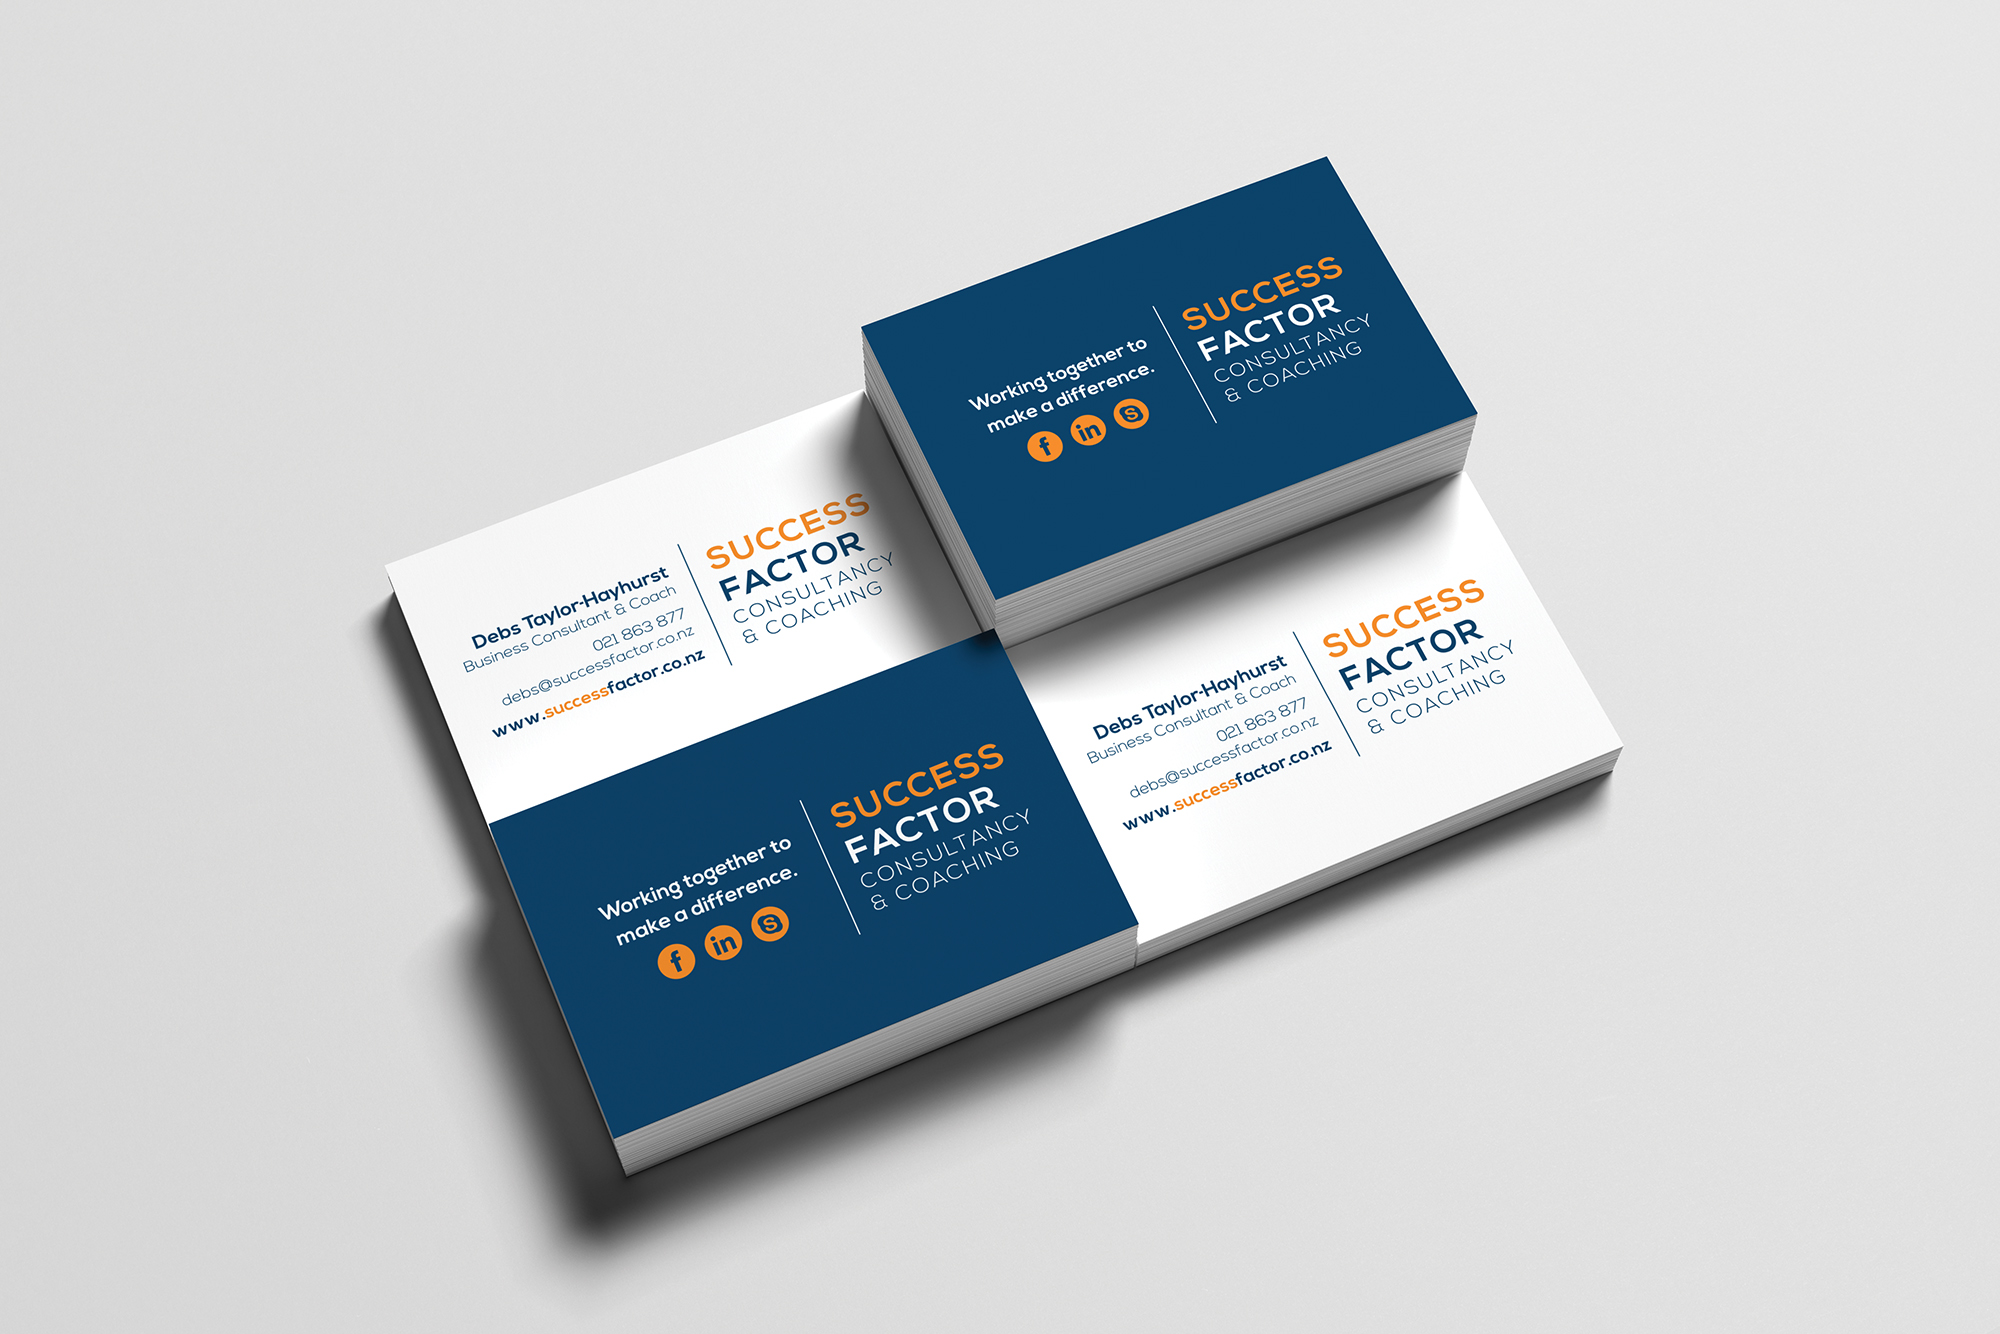 Success Factor Business Card Design.